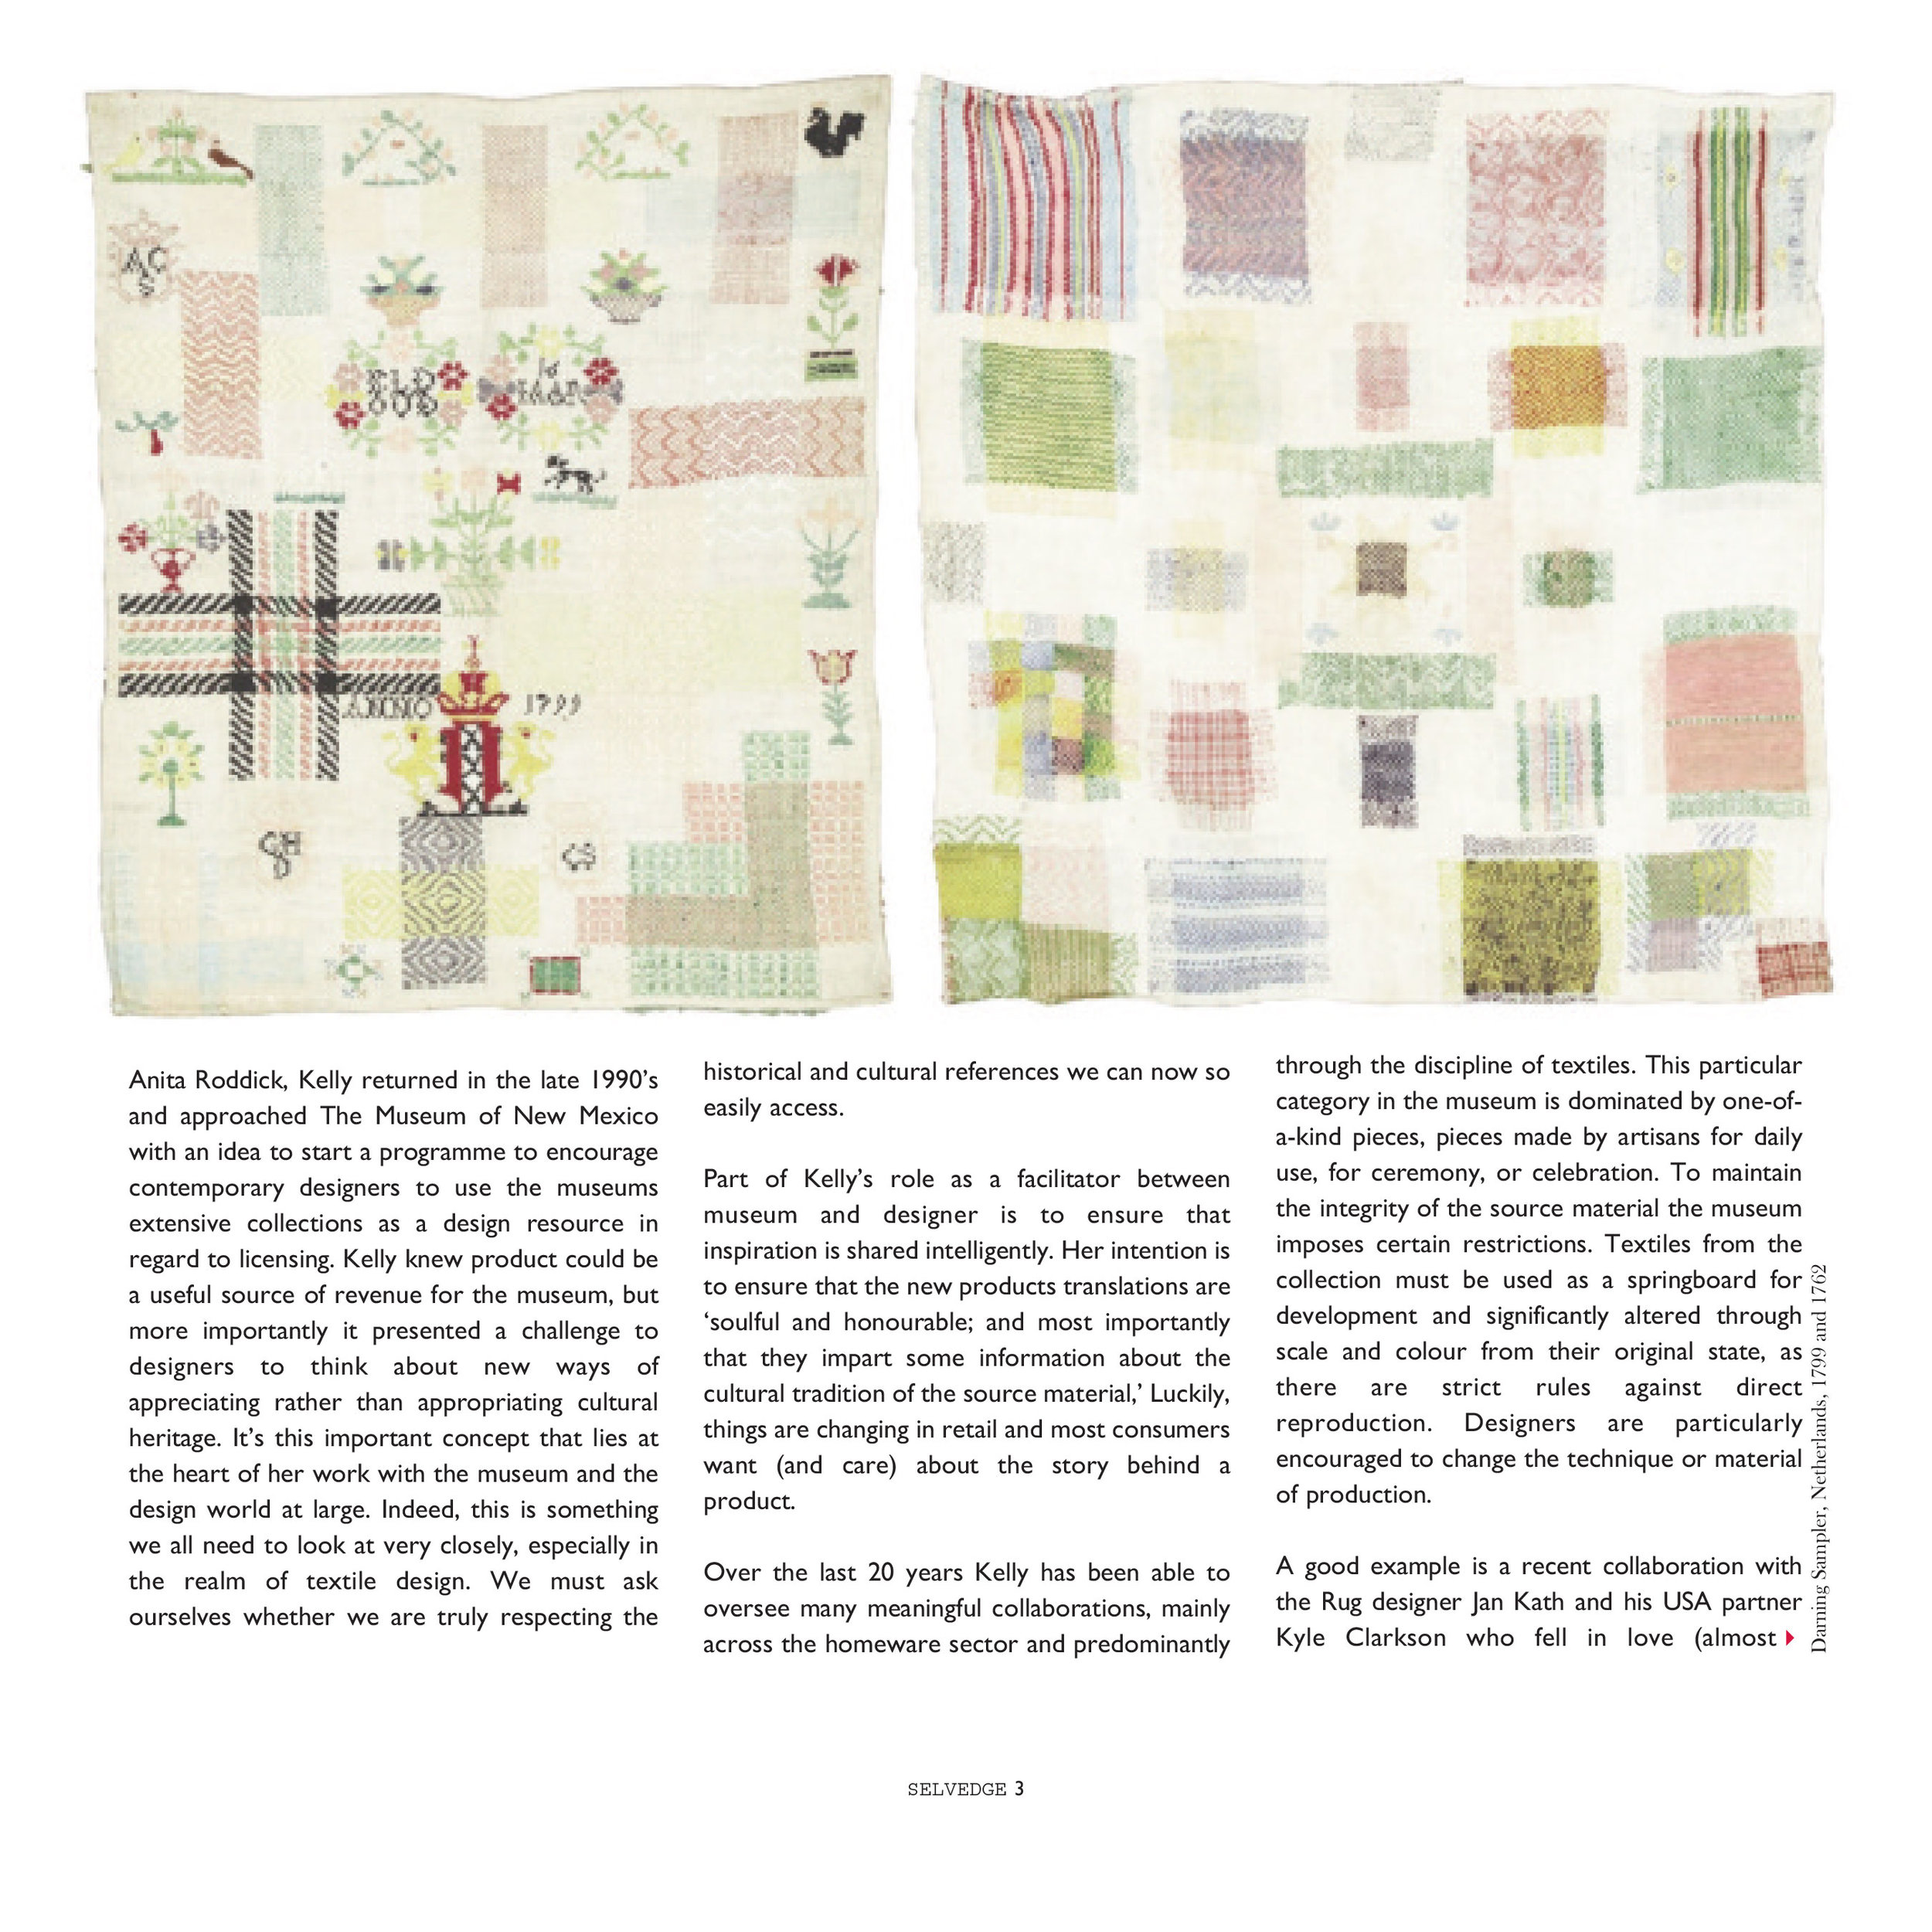 Selvedge-Story-MNM-licensing-3-web.jpg